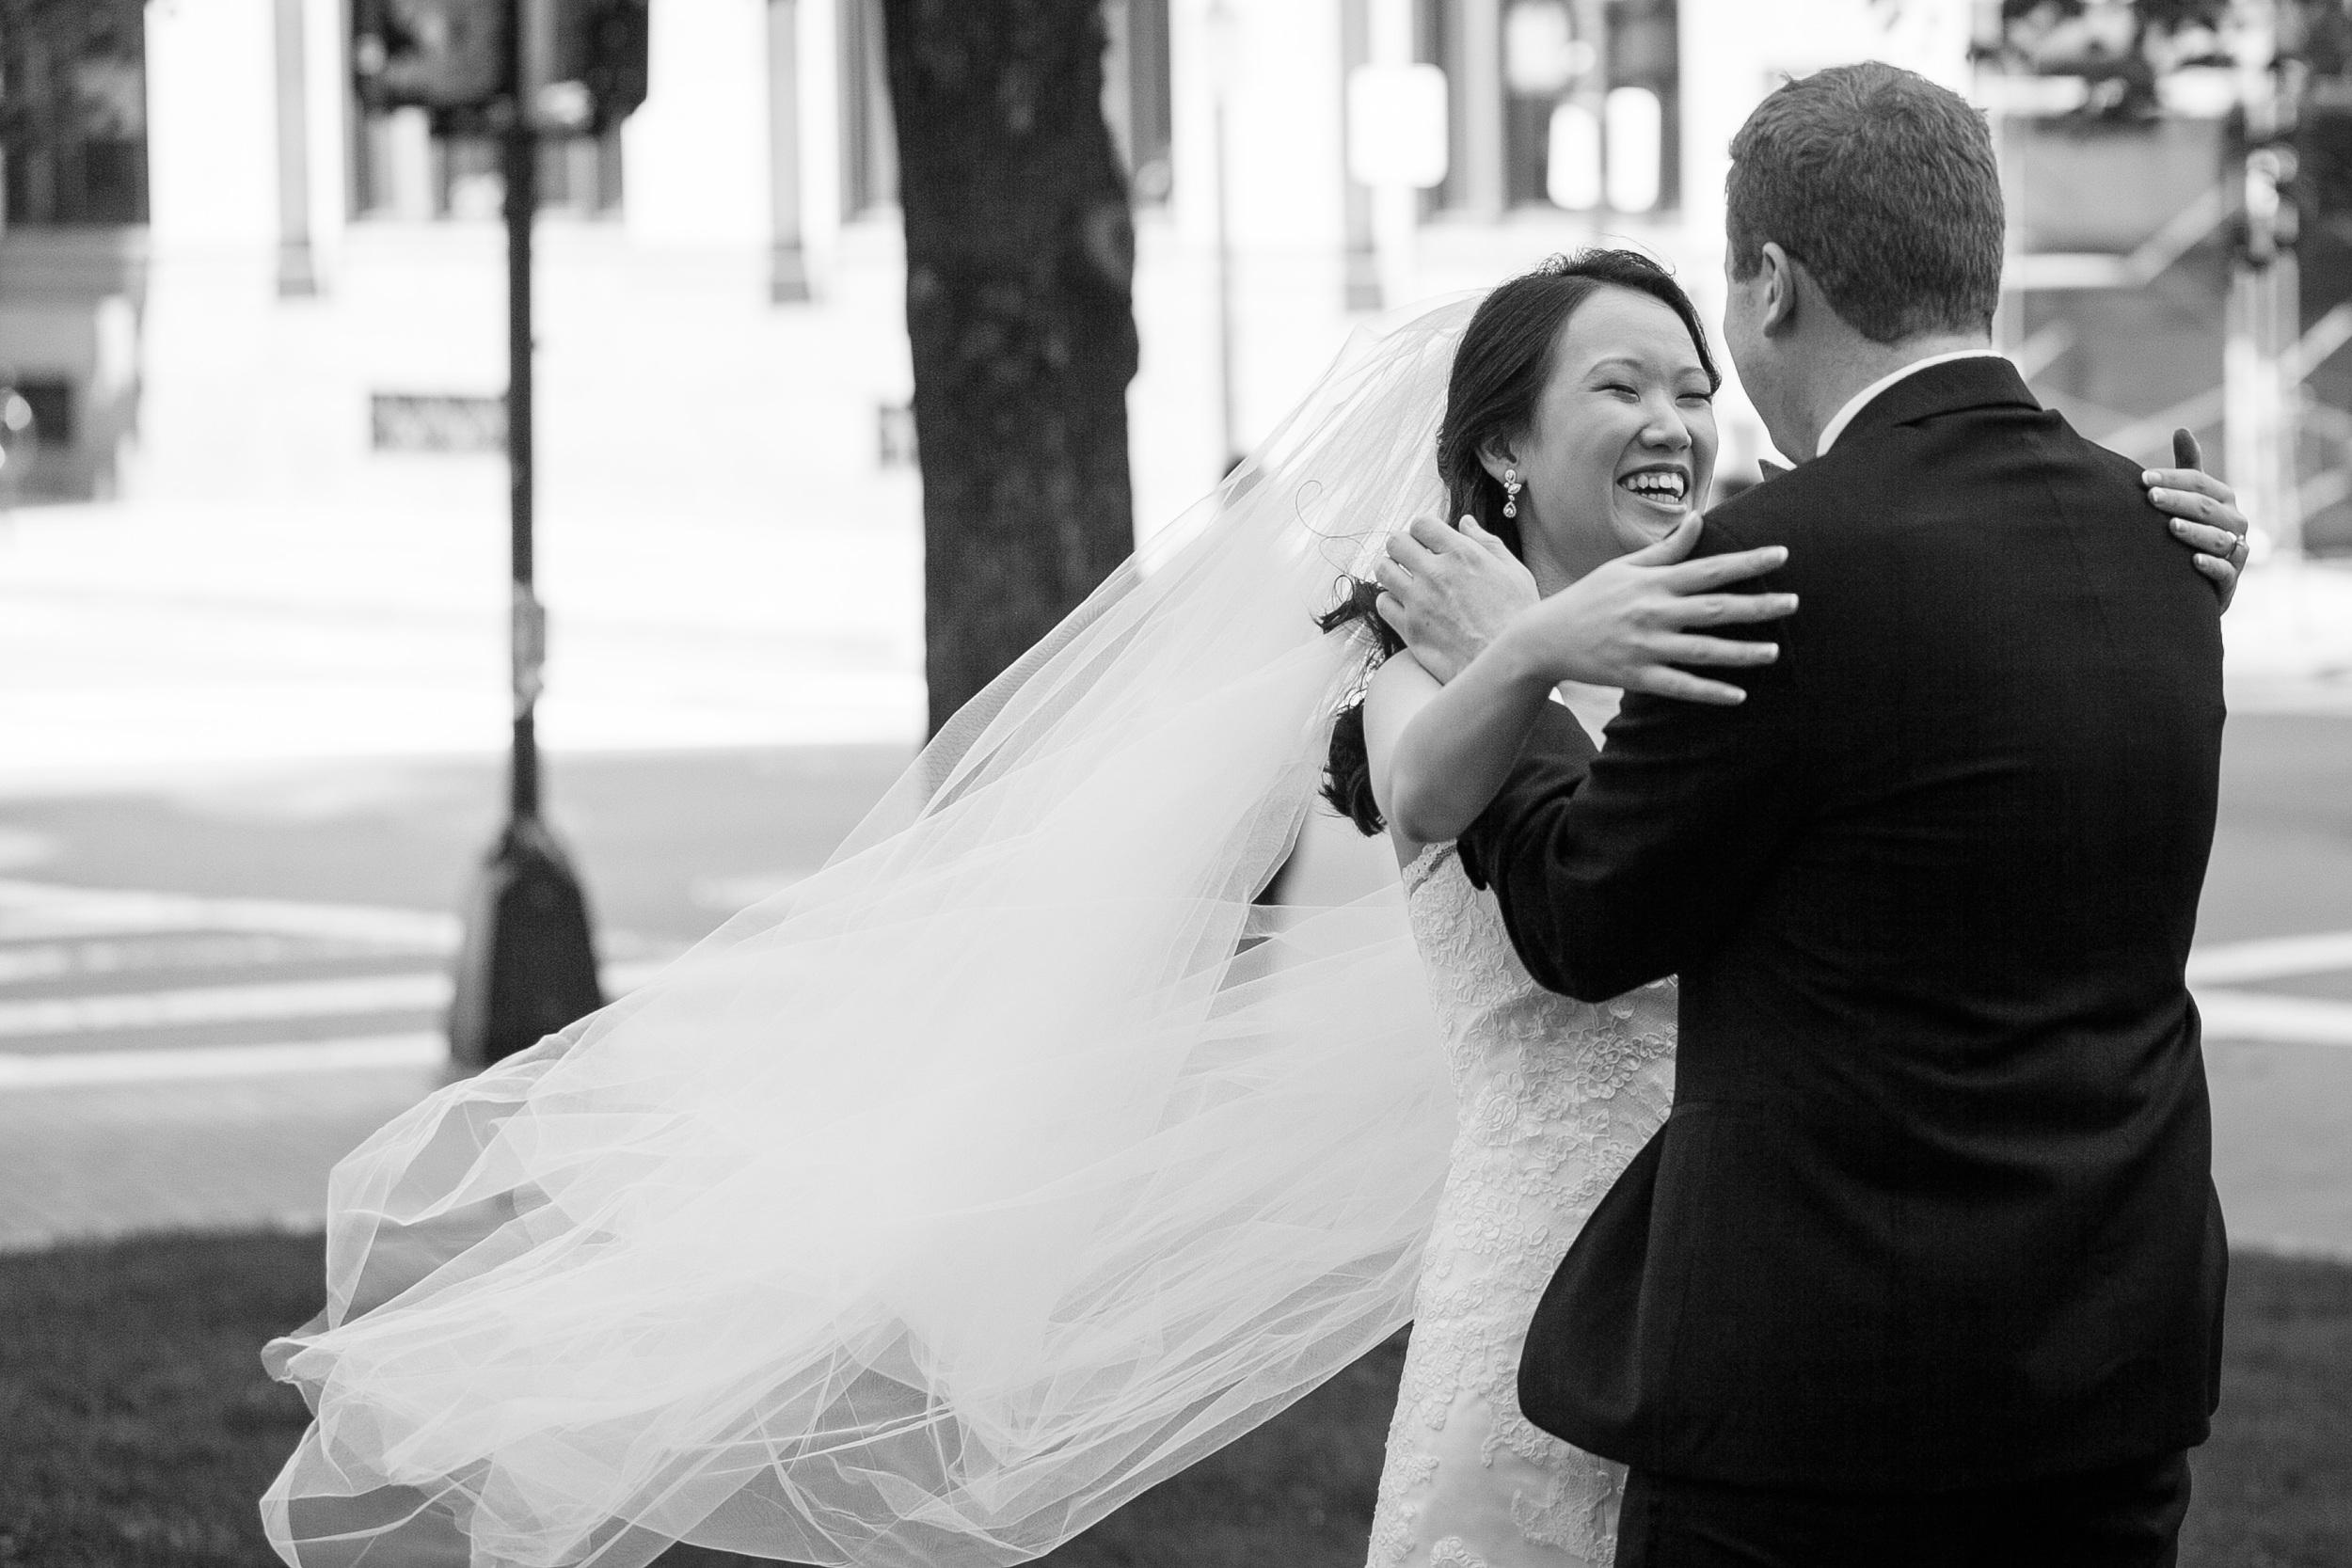 Asian-Wedding-State-Room-Boston-Massachusetts-Documentary-Photography-by-Jacek-Dolata-2.jpg